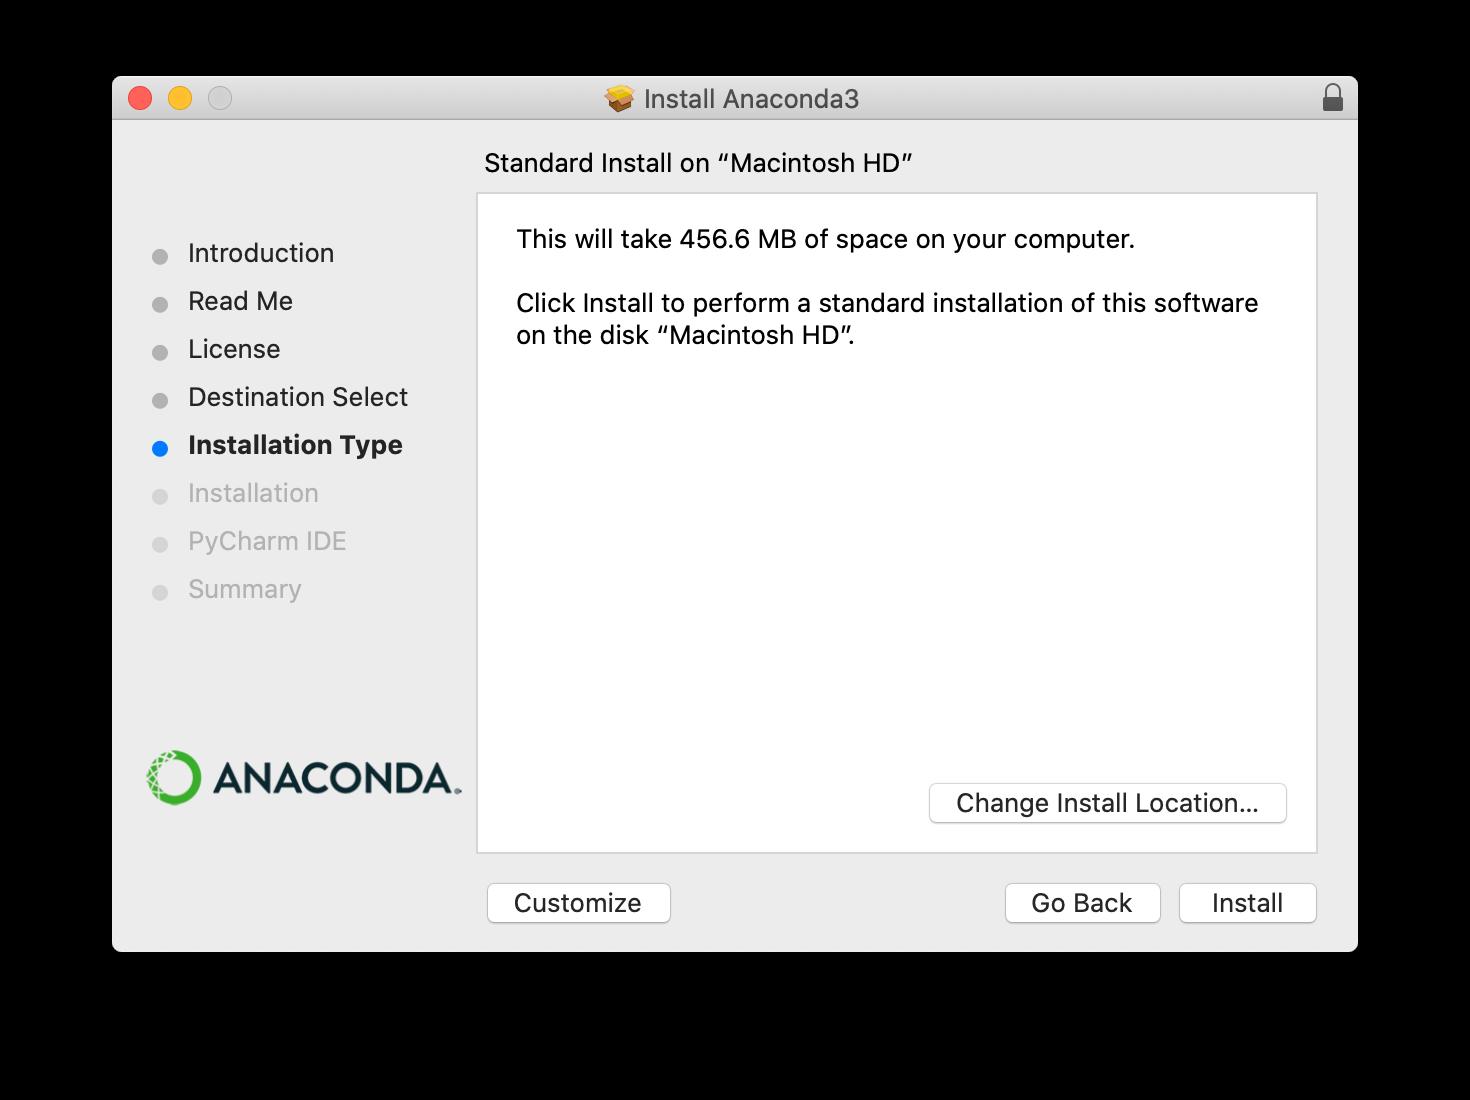 Anaconda installer screenshot step 4